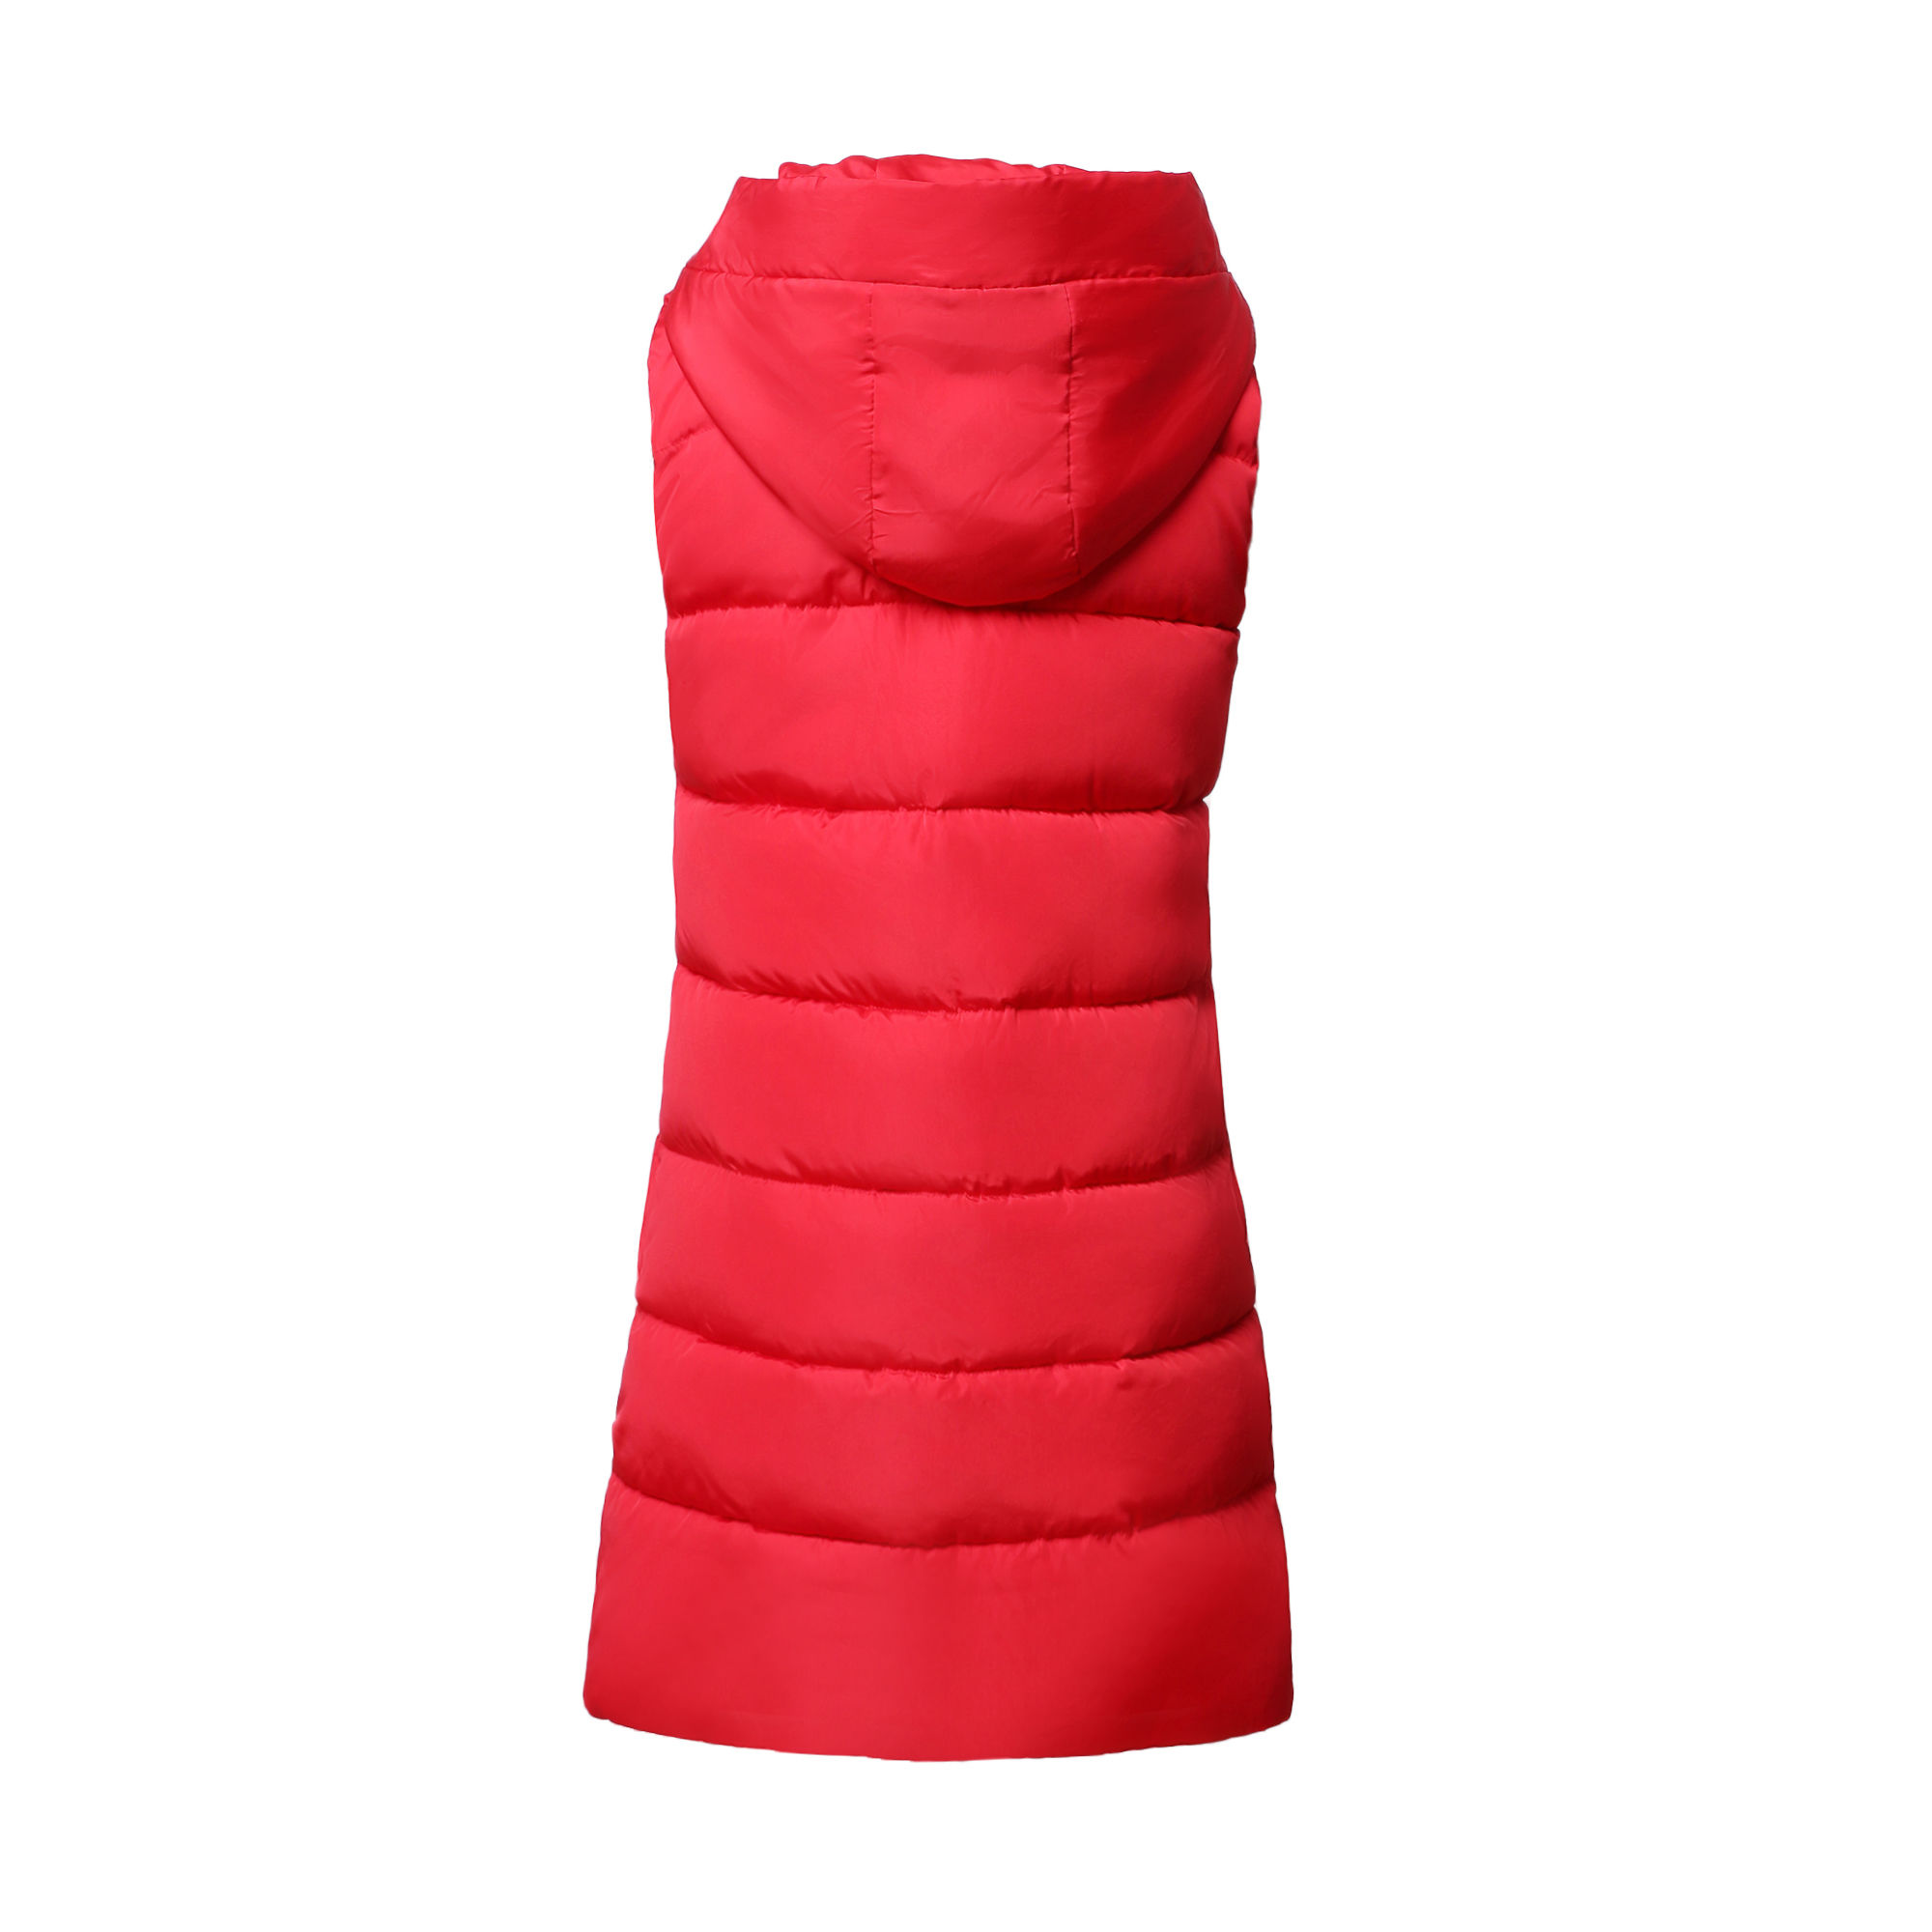 Autumn Winter Women Waistcoat Sleeveless Vest Jacket Hooded Warm Long 10